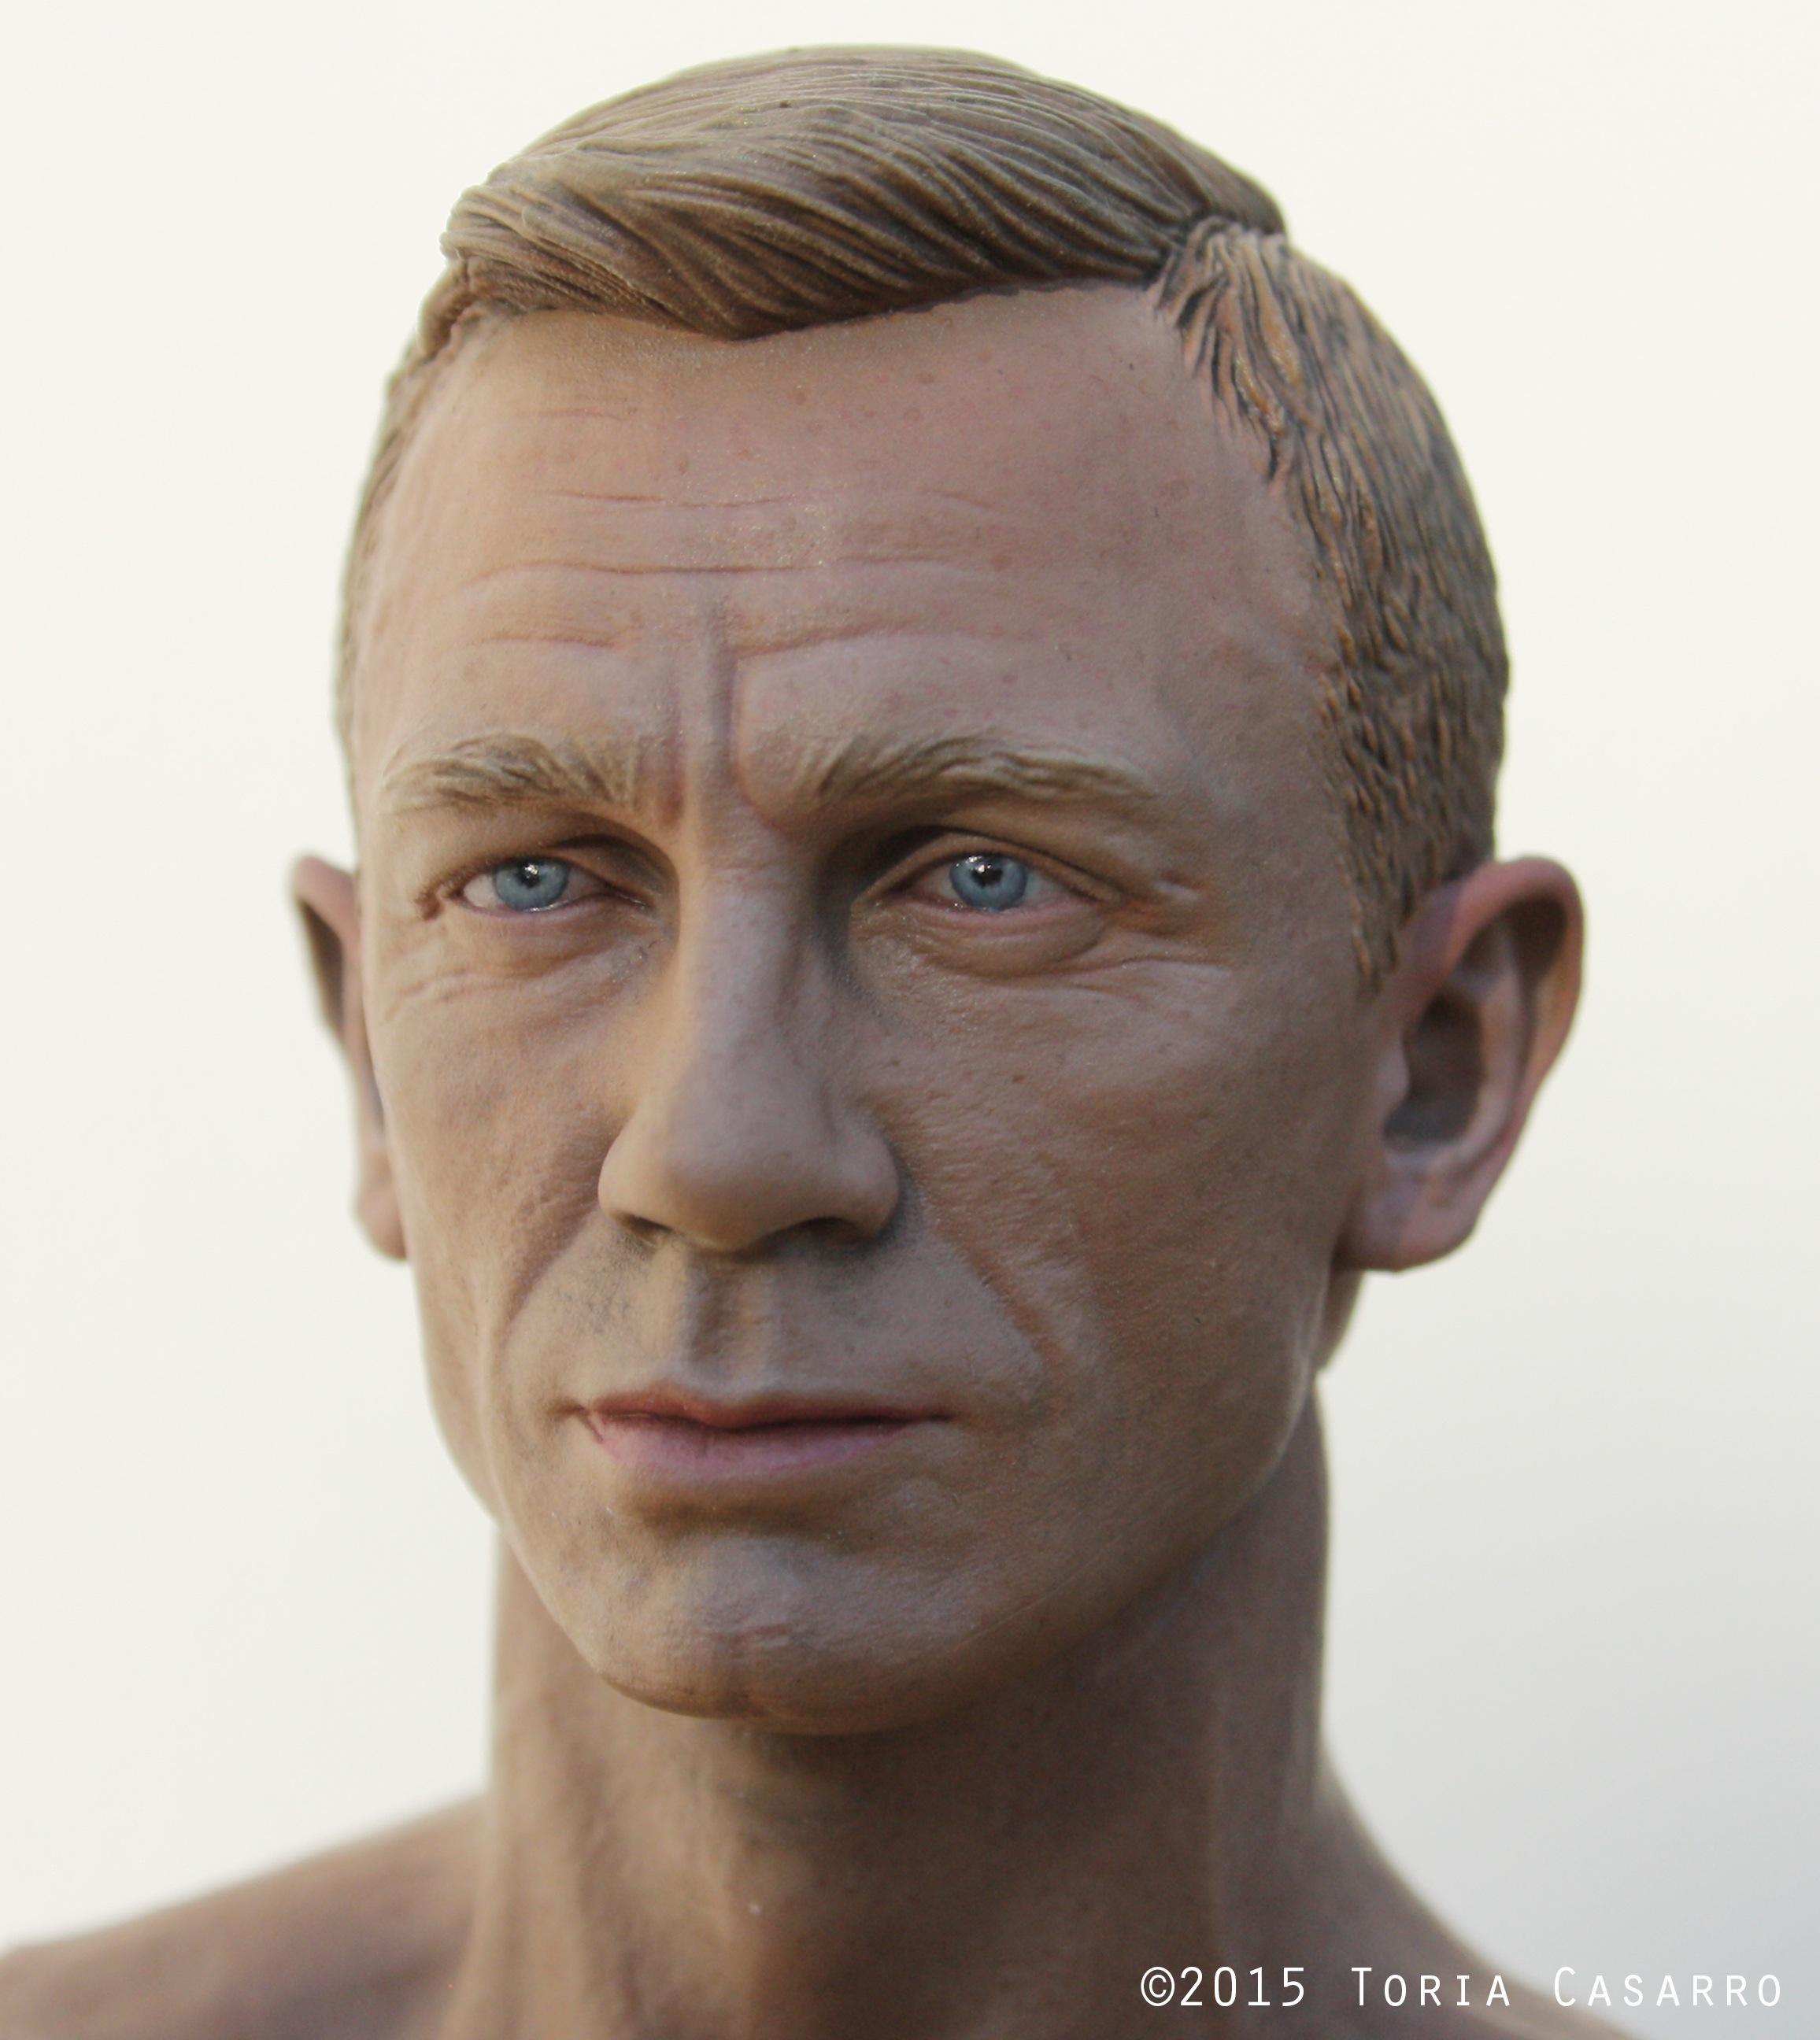 1/6th scale Daniel Craig by Toria Casarro